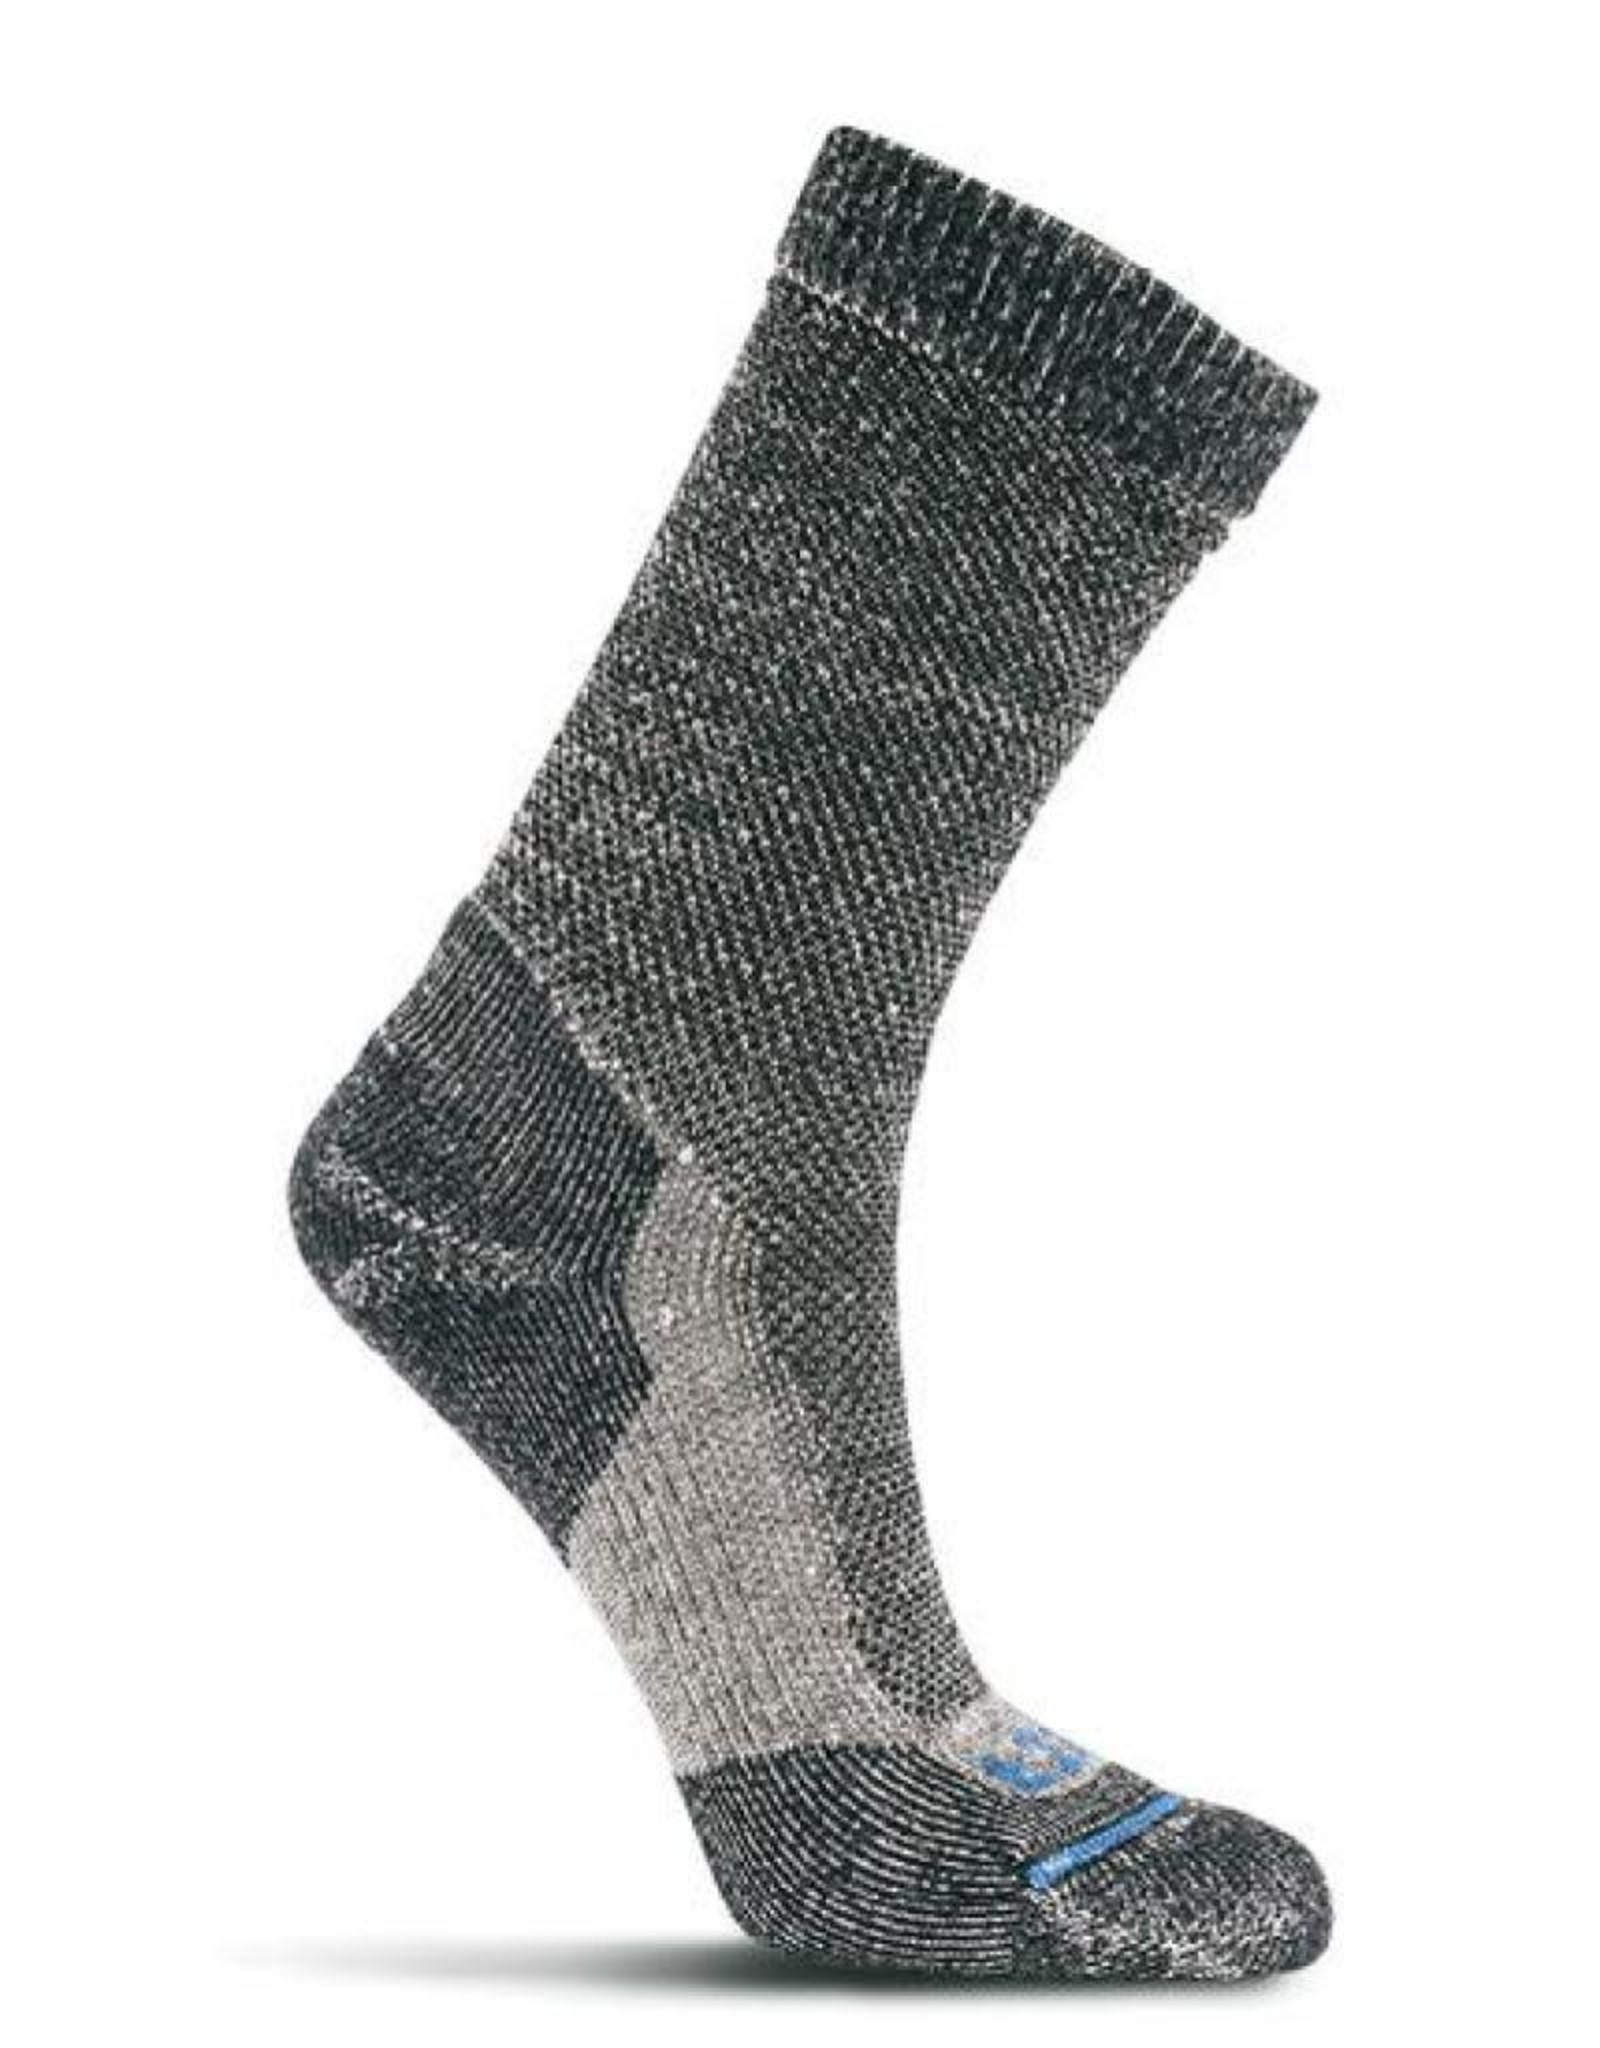 FITS Light Rugged Crew Sock